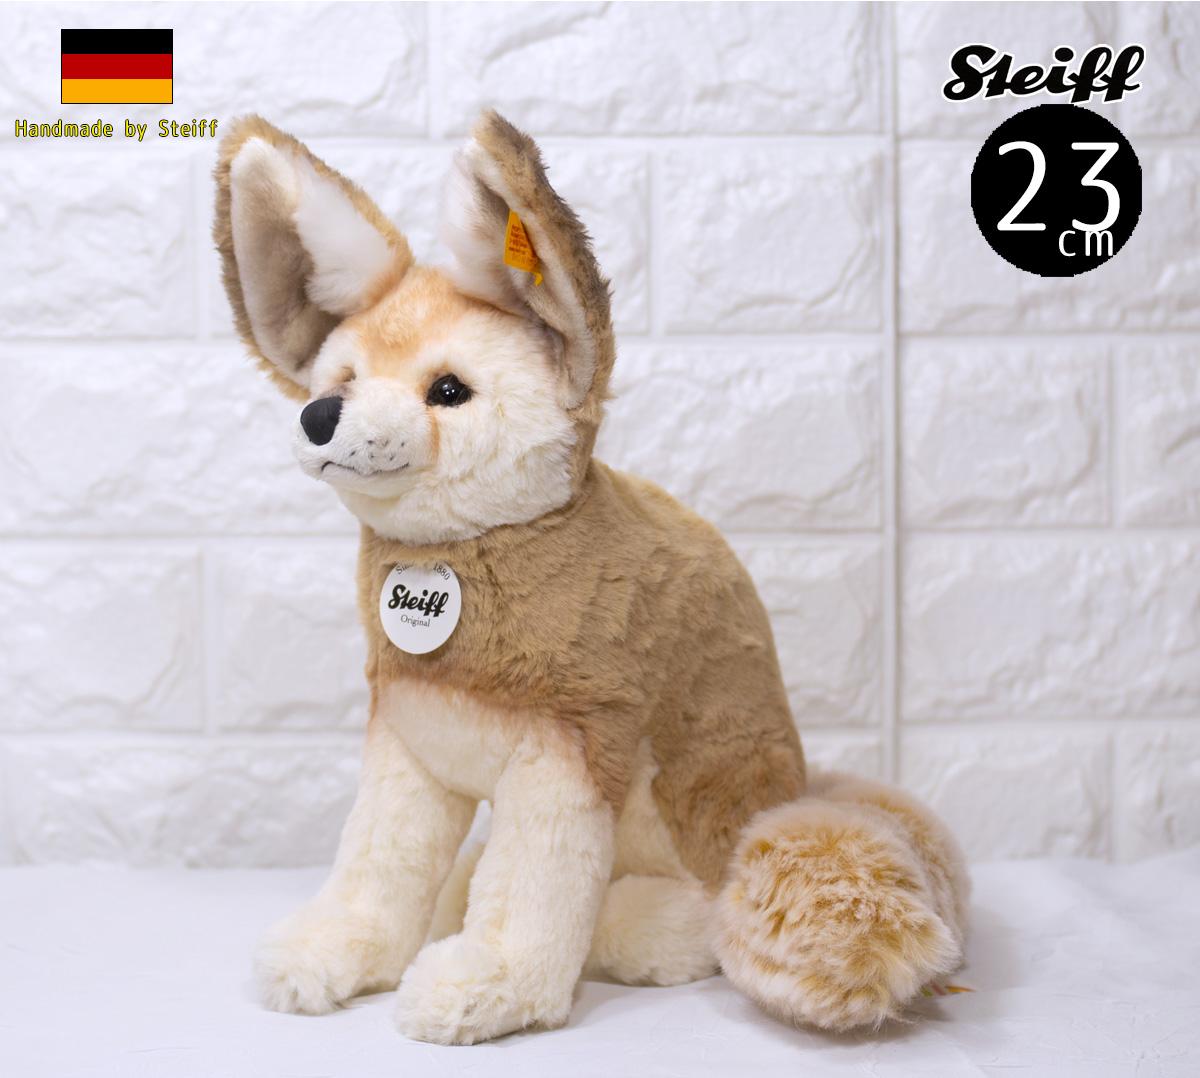 Steiffシュタイフ フォクシー フォックス キツネ 23cm Foxy fox ぬいぐるみ プレゼント ふわふわ クリスマス